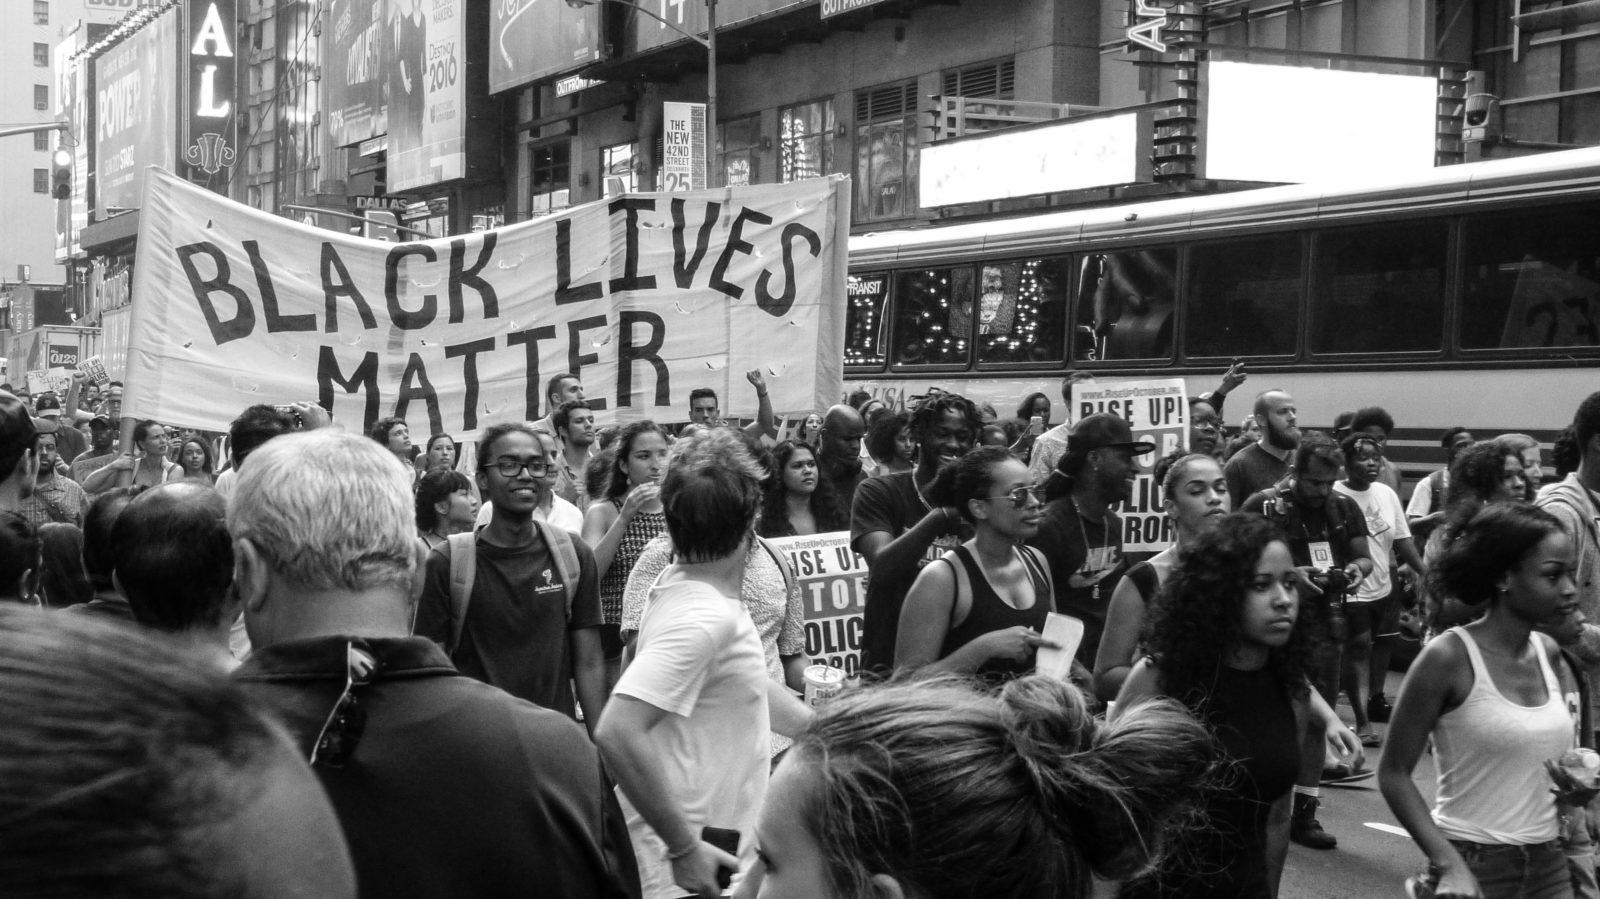 Kaurs for Black Lives